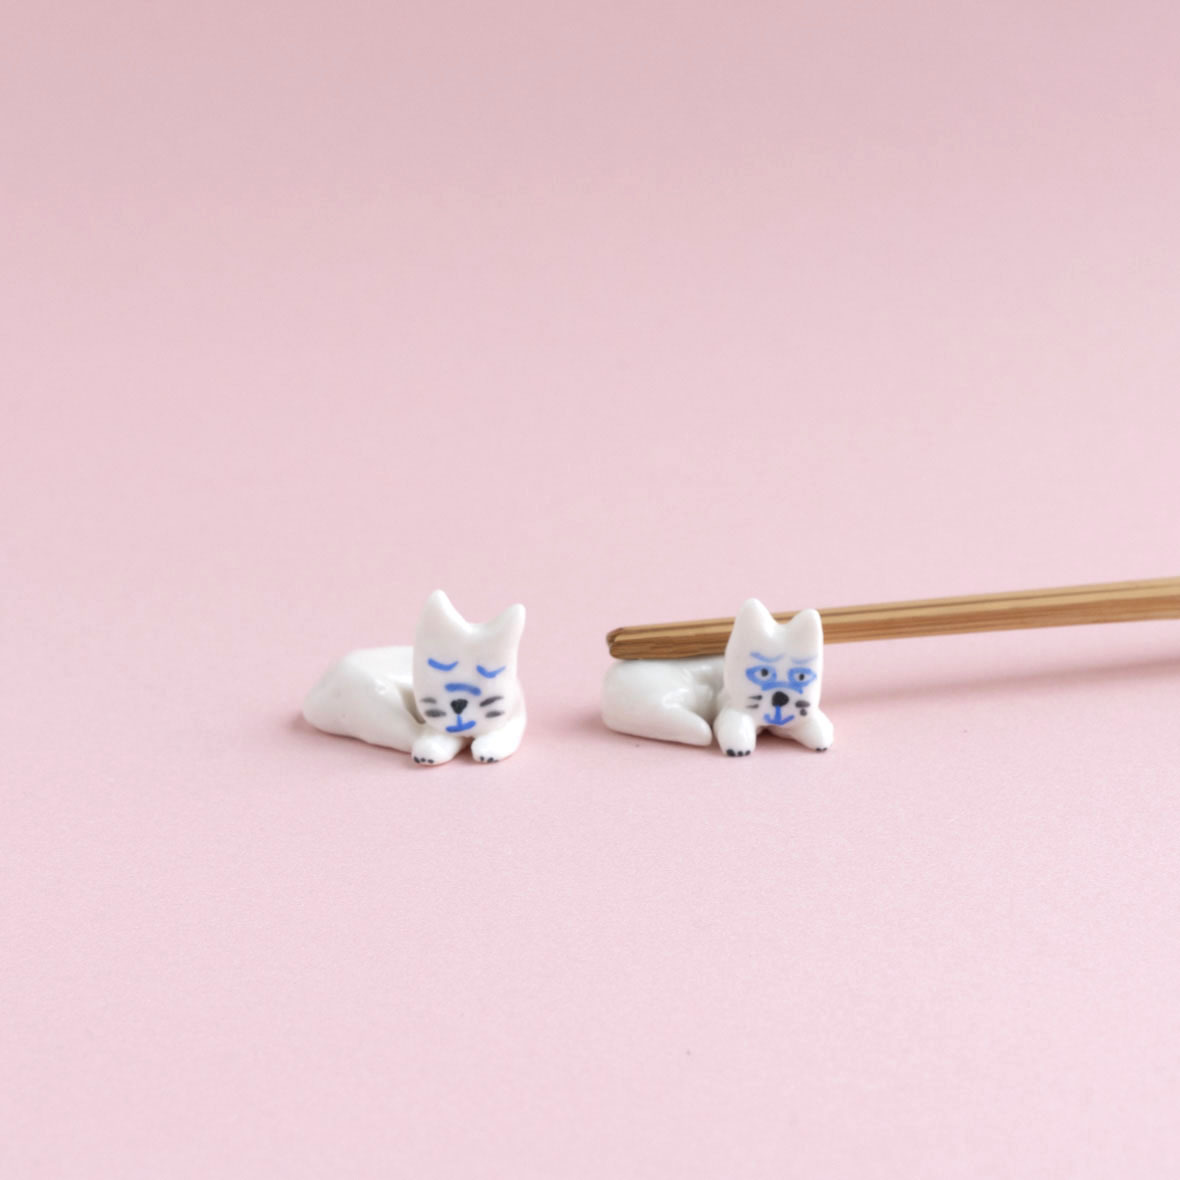 【TK】箸置き(ねこ・ラウンド)NO.10